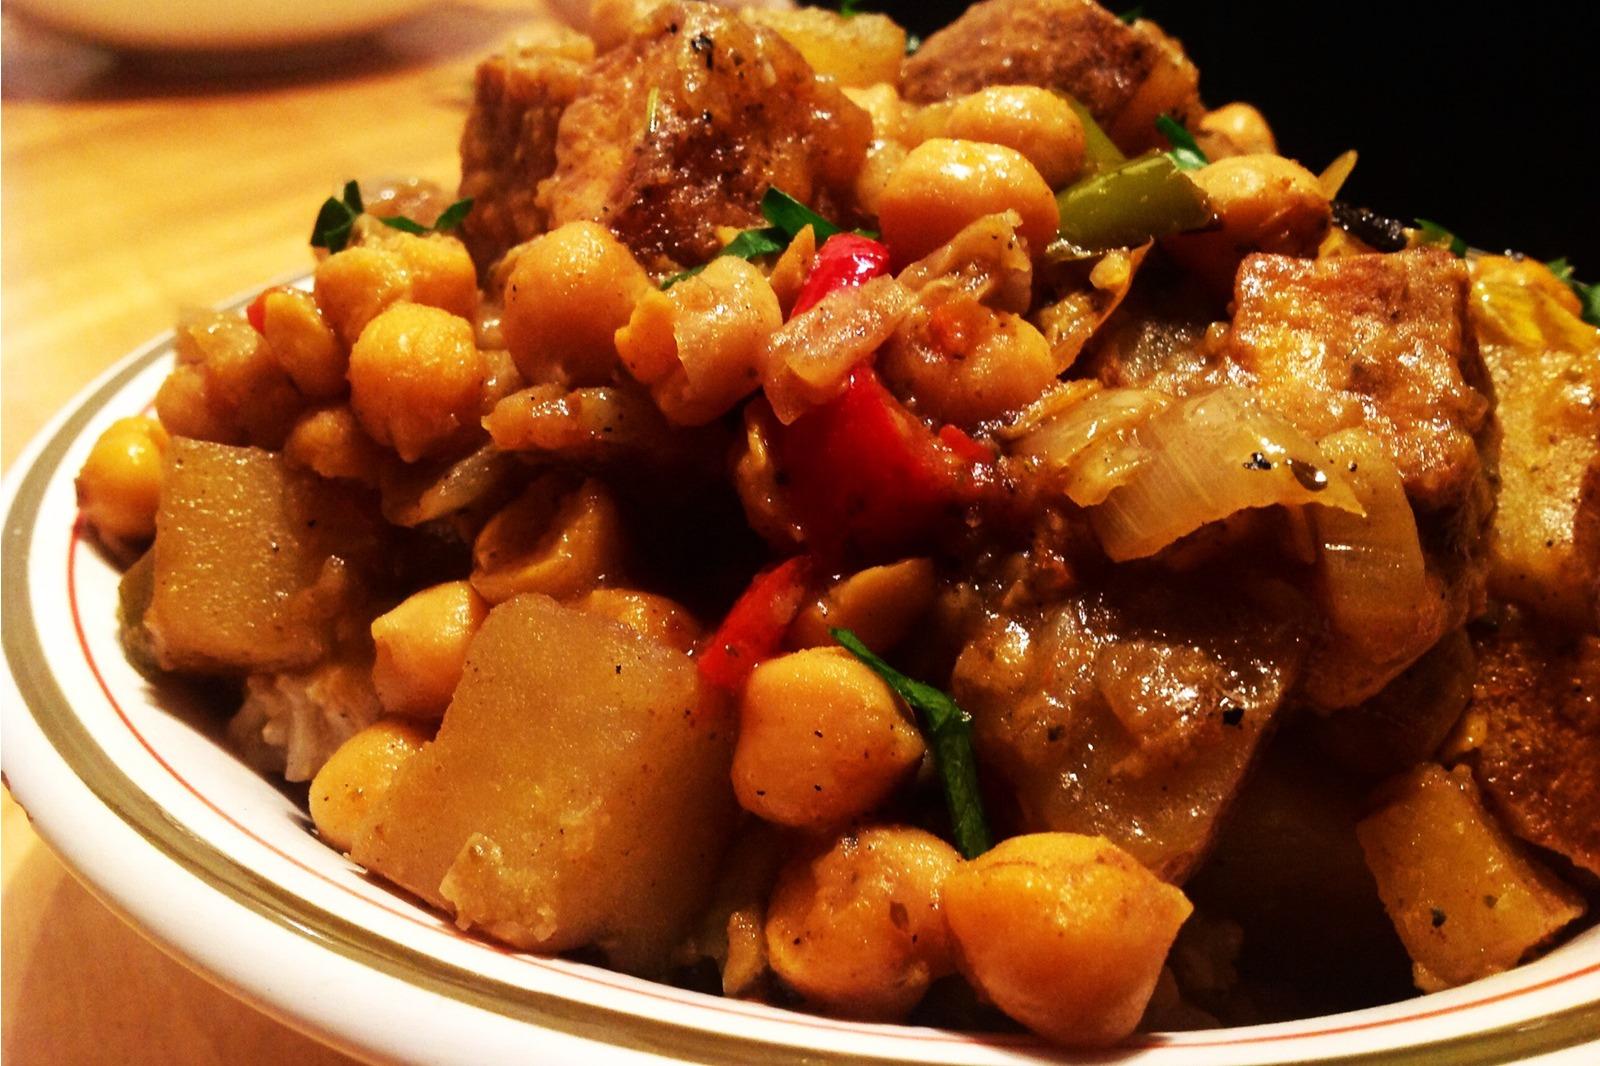 Vegan Jamaican Curried Tofu With Chickpeas